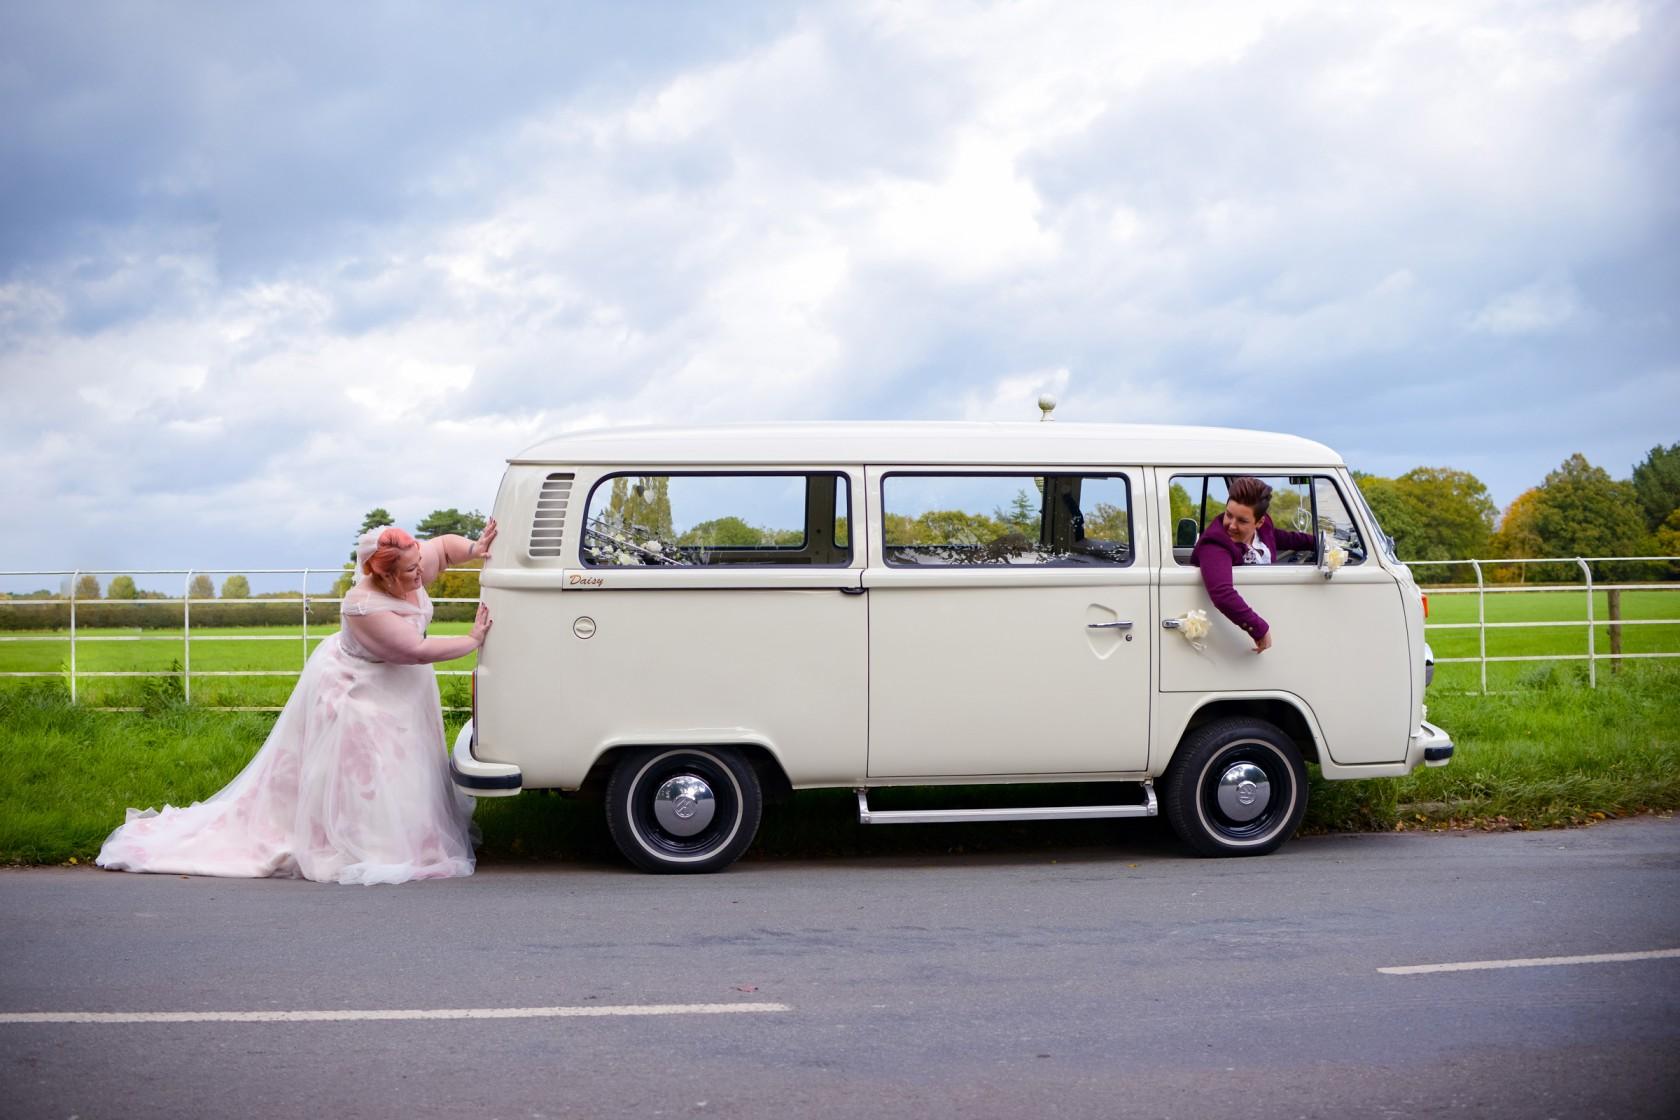 wonderland wedding - real wedding inspiration - DIY wedding - romantic wedding - same sex wedding - lgbtq wedding - unconventional wedding - wedding camper van - fun wedding photo